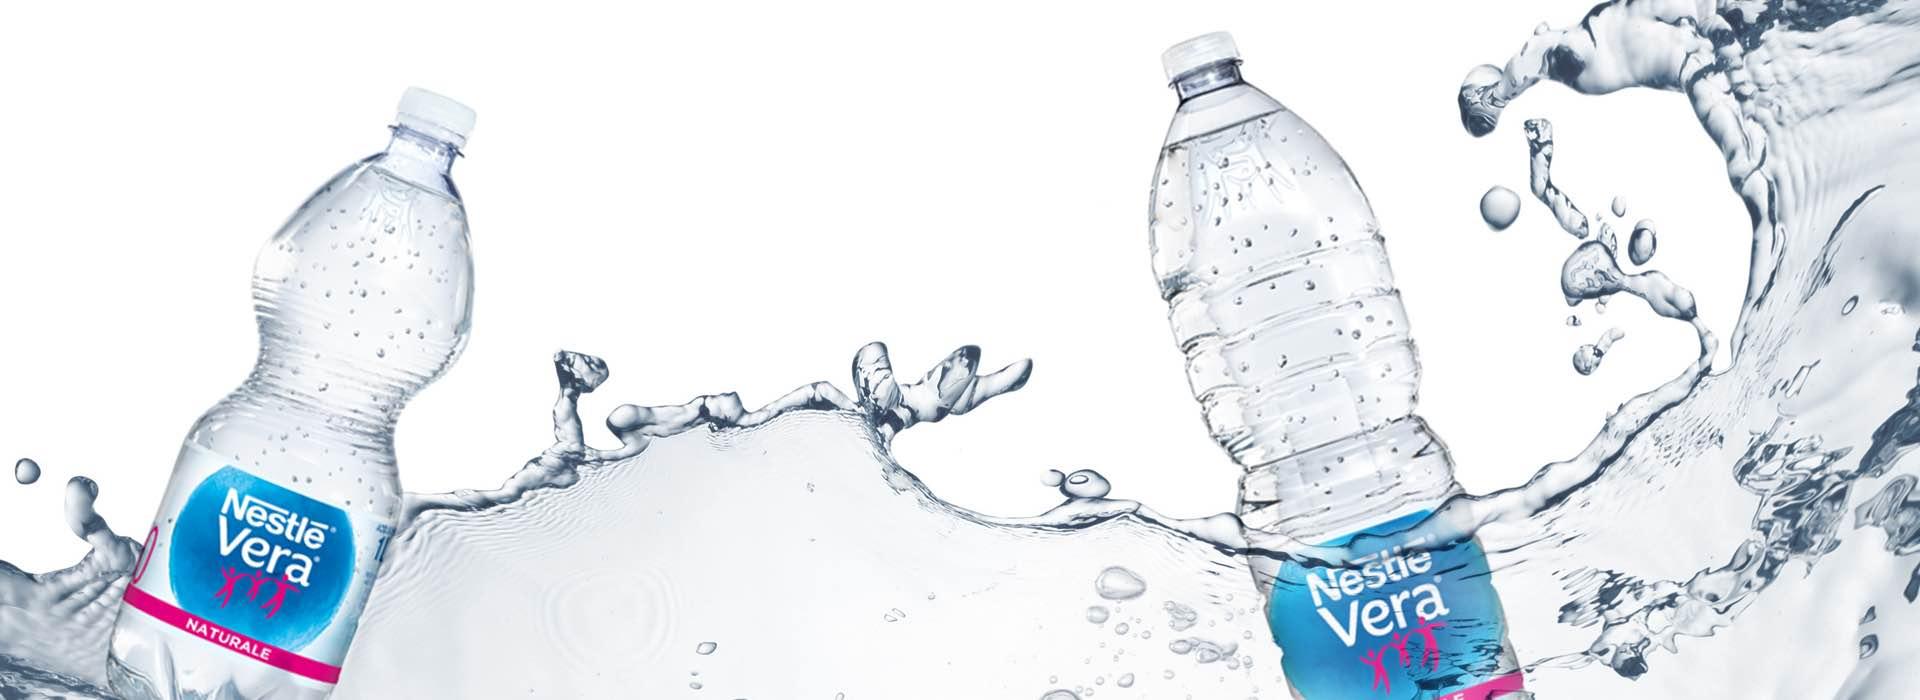 Nestlé Vera bottled water labels repackaging